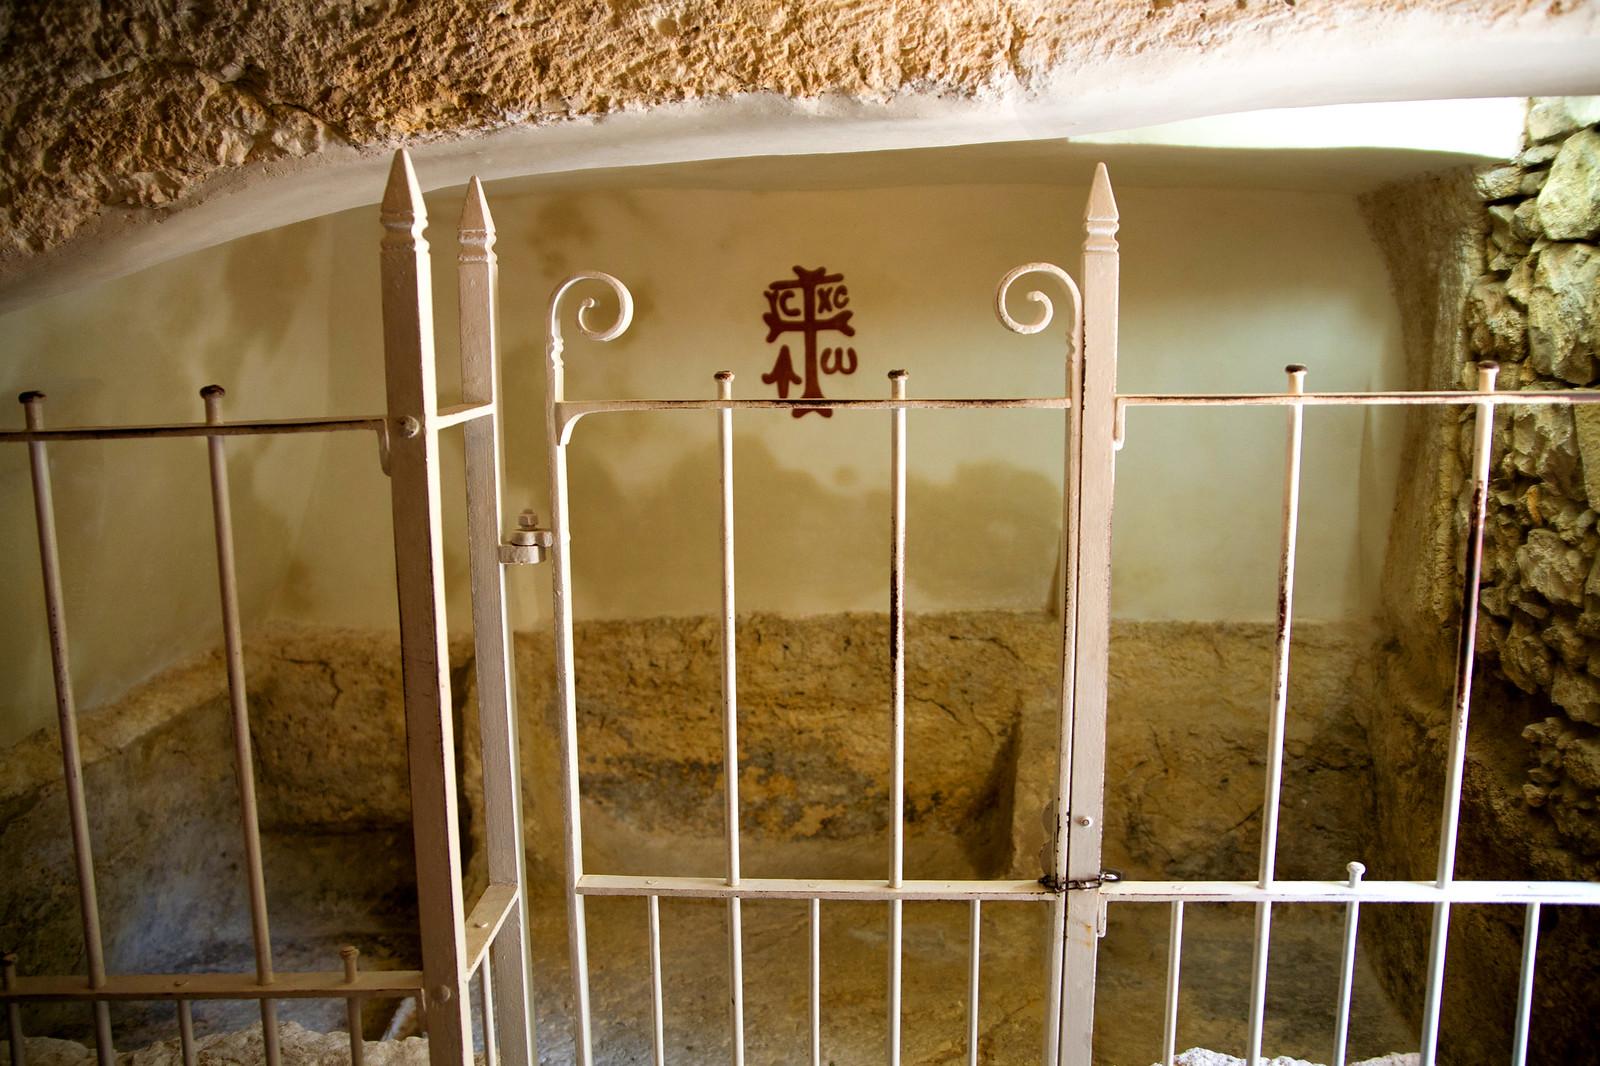 Jerusalem_Garden Tomb 10_Noam Chen_IMOT